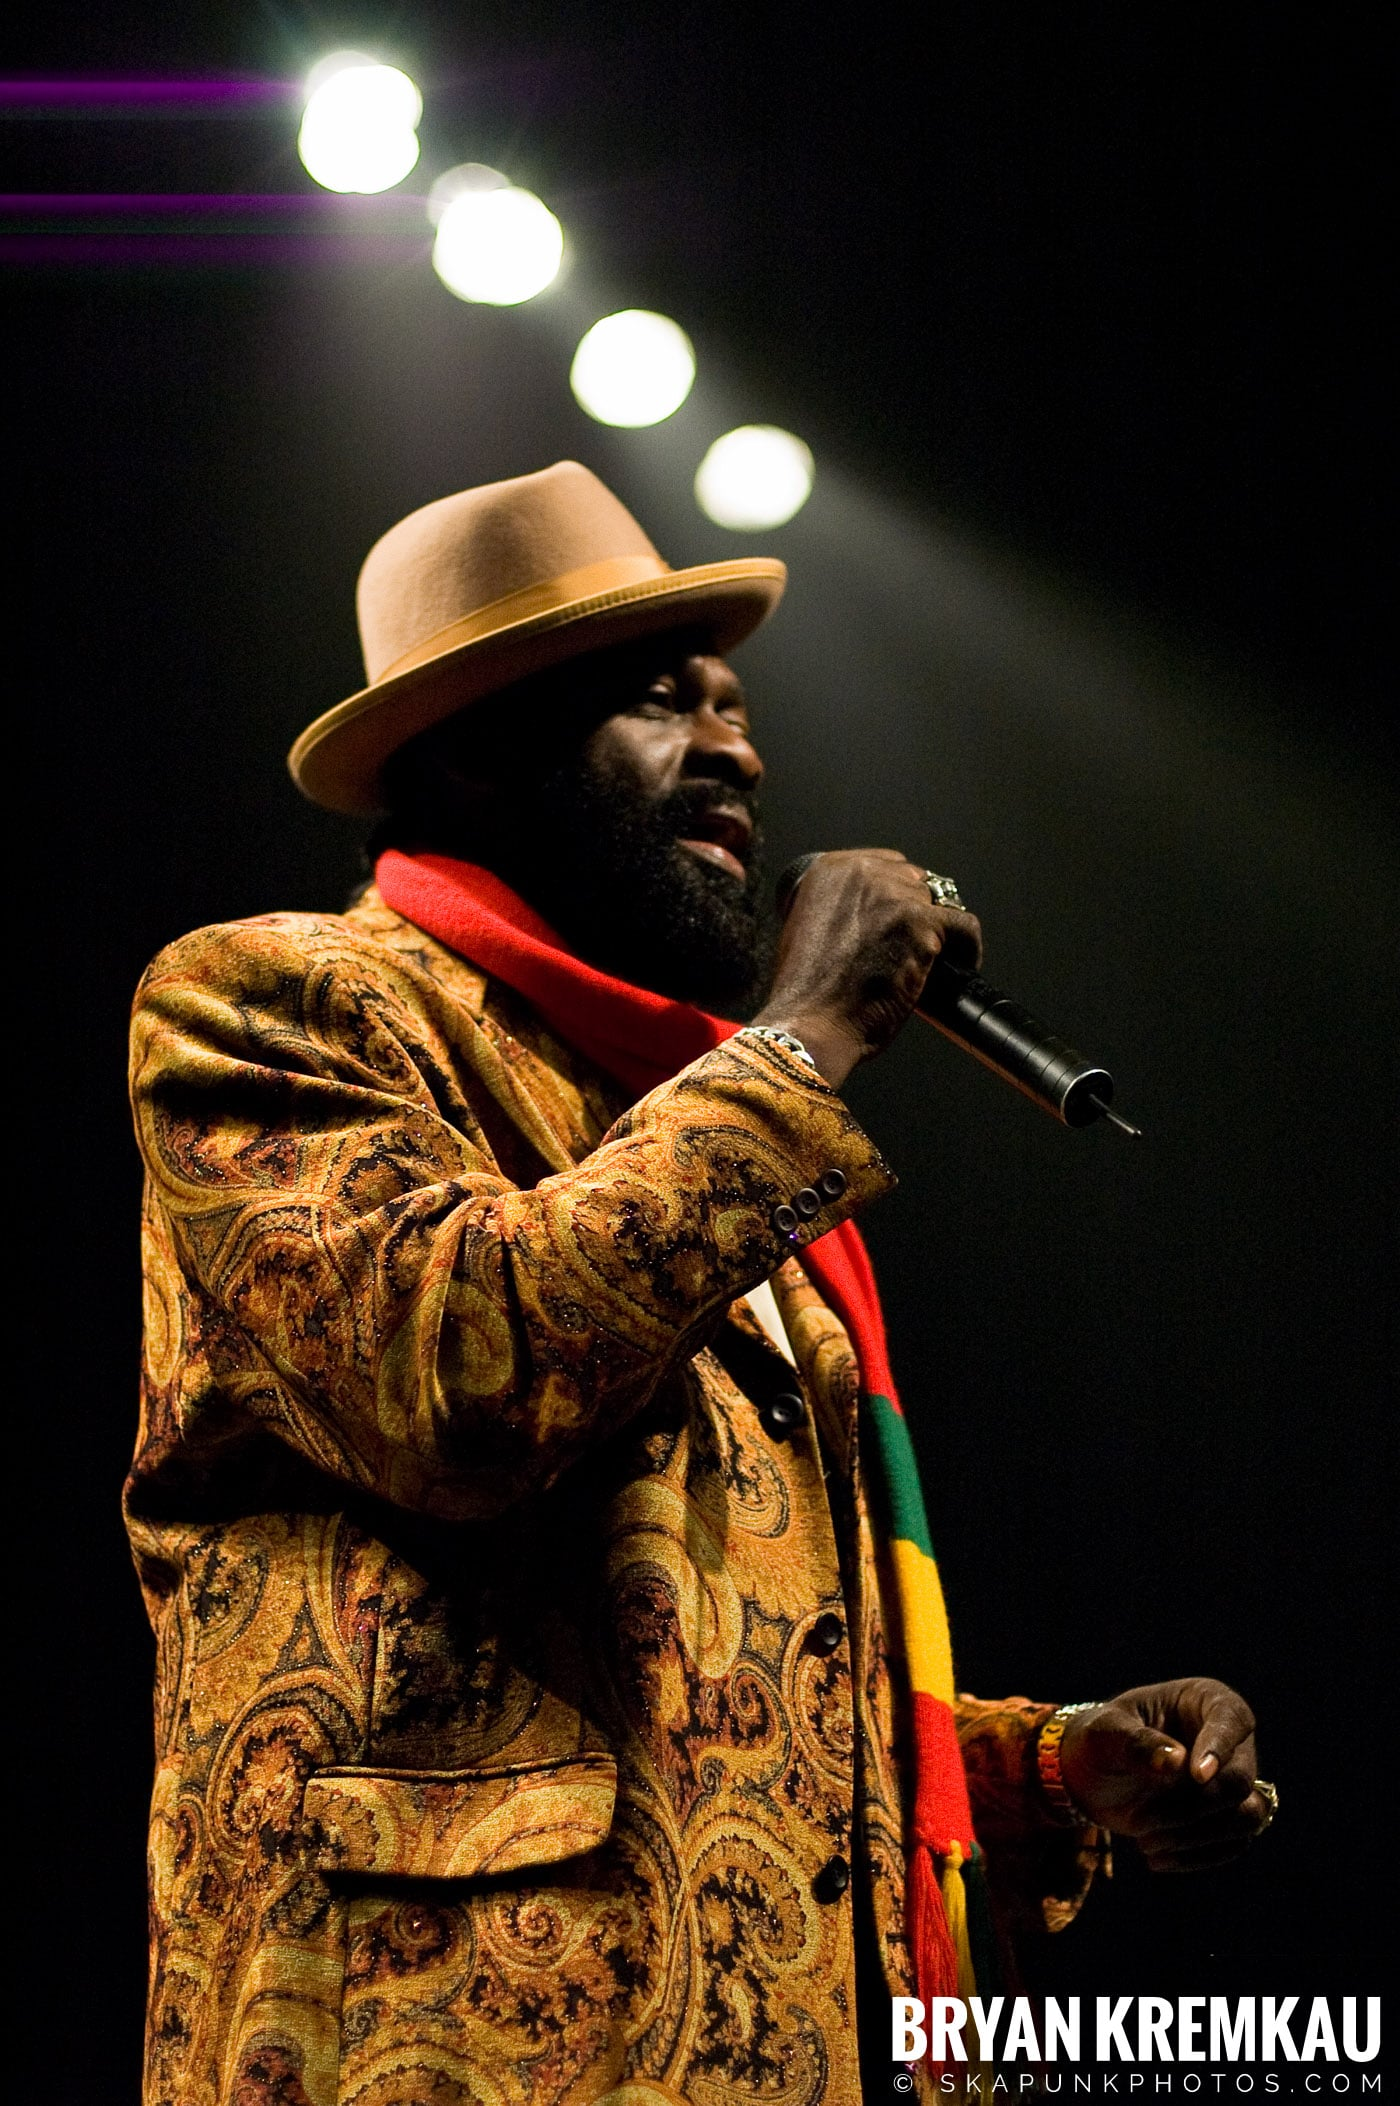 Jimmy Riley @ Vintage Reggae Fest - Hammerstein Ballroom, NYC - 12.16.07 (2)